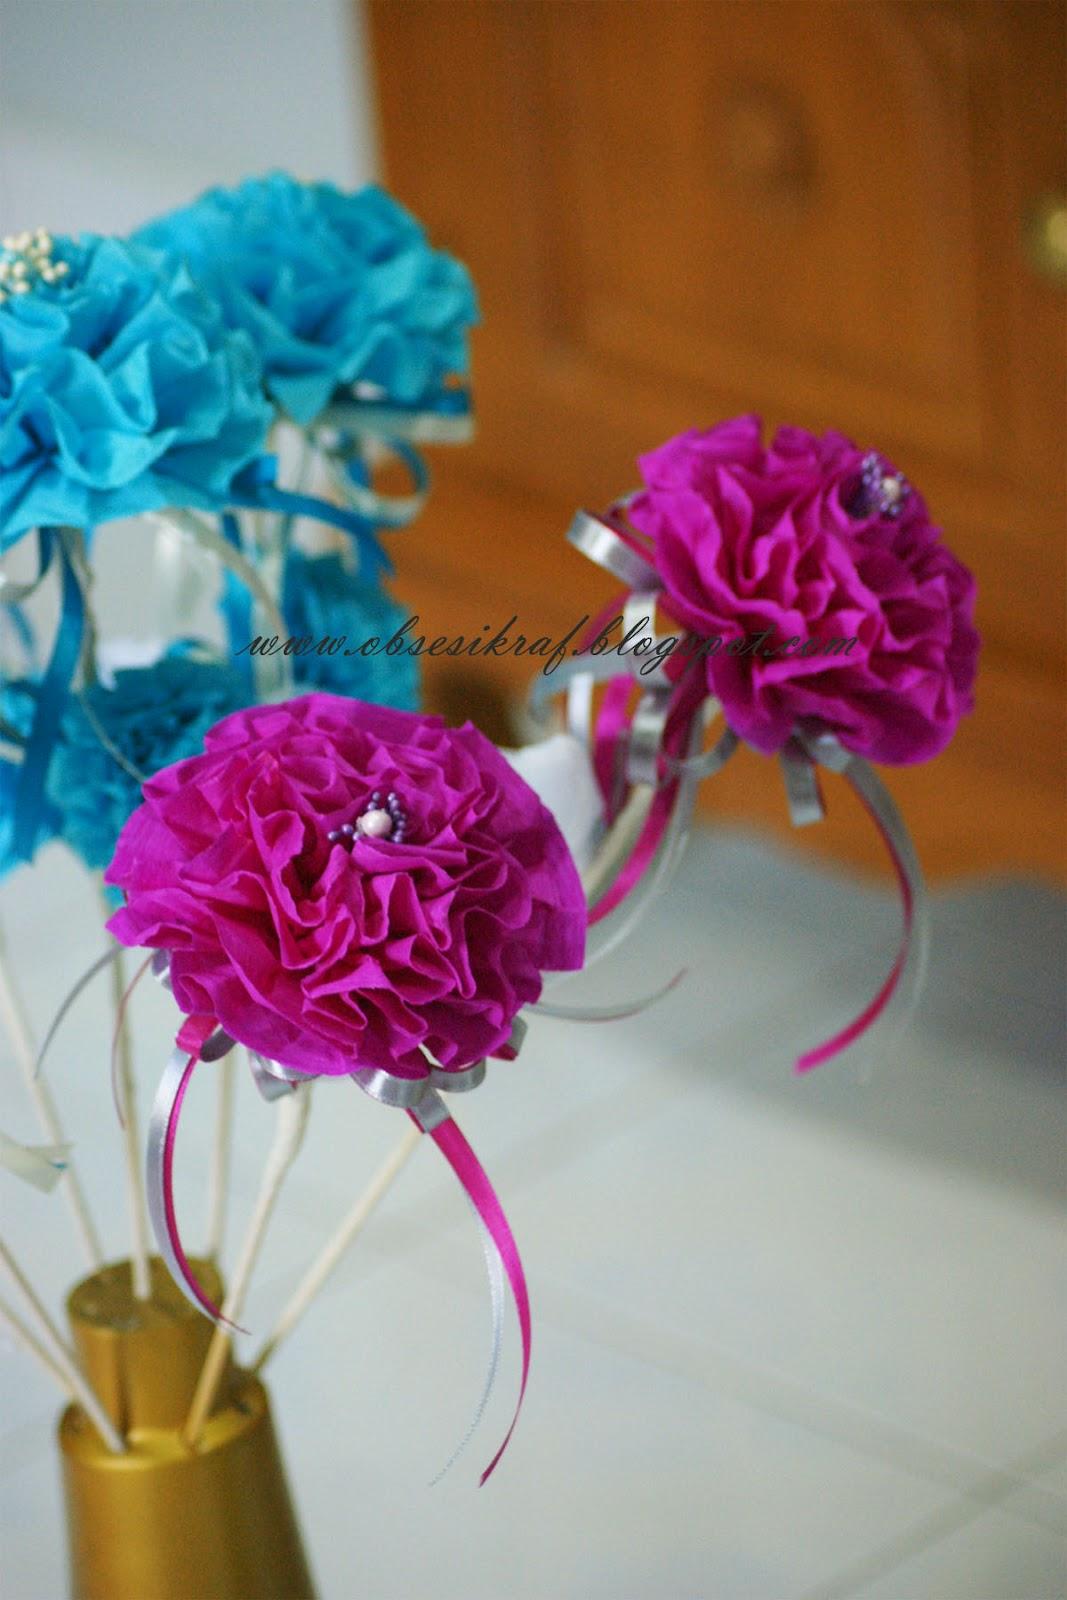 http://1.bp.blogspot.com/-ggB08GqZ0lA/T1waGkNfGSI/AAAAAAAAAsk/wQmy6bGvEYM/s1600/purple1.jpg